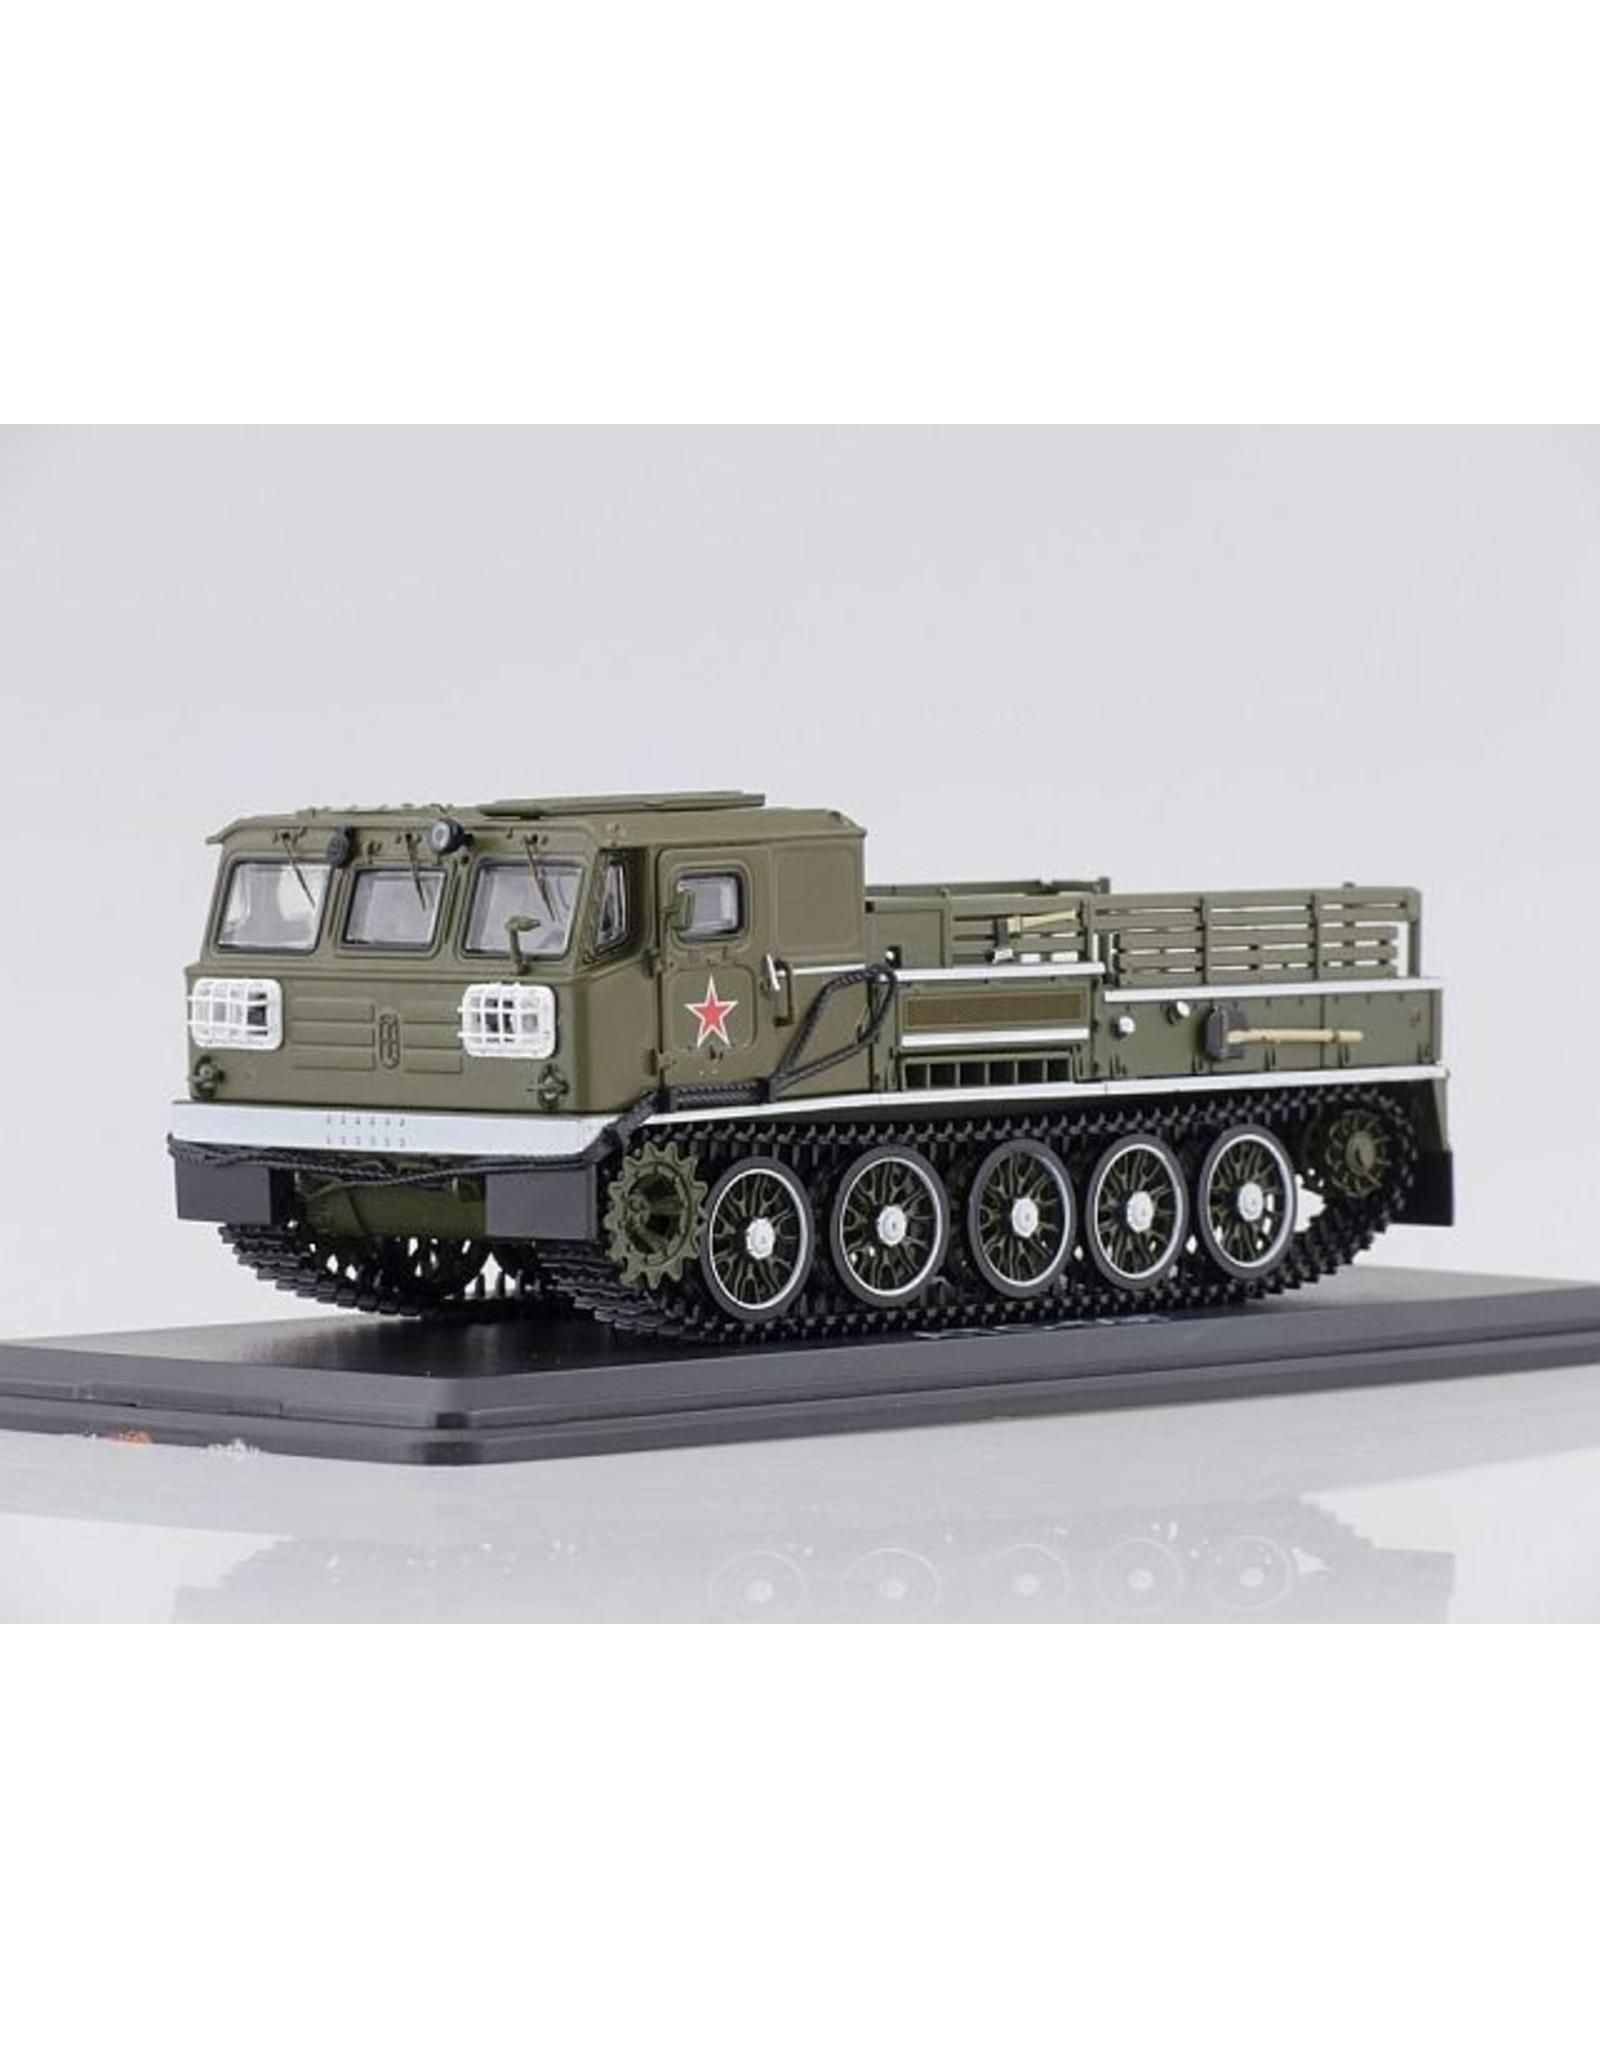 KMZ(Kragnorsky Mechanical Works) ARTILLERY TRACTOR ATS-59G